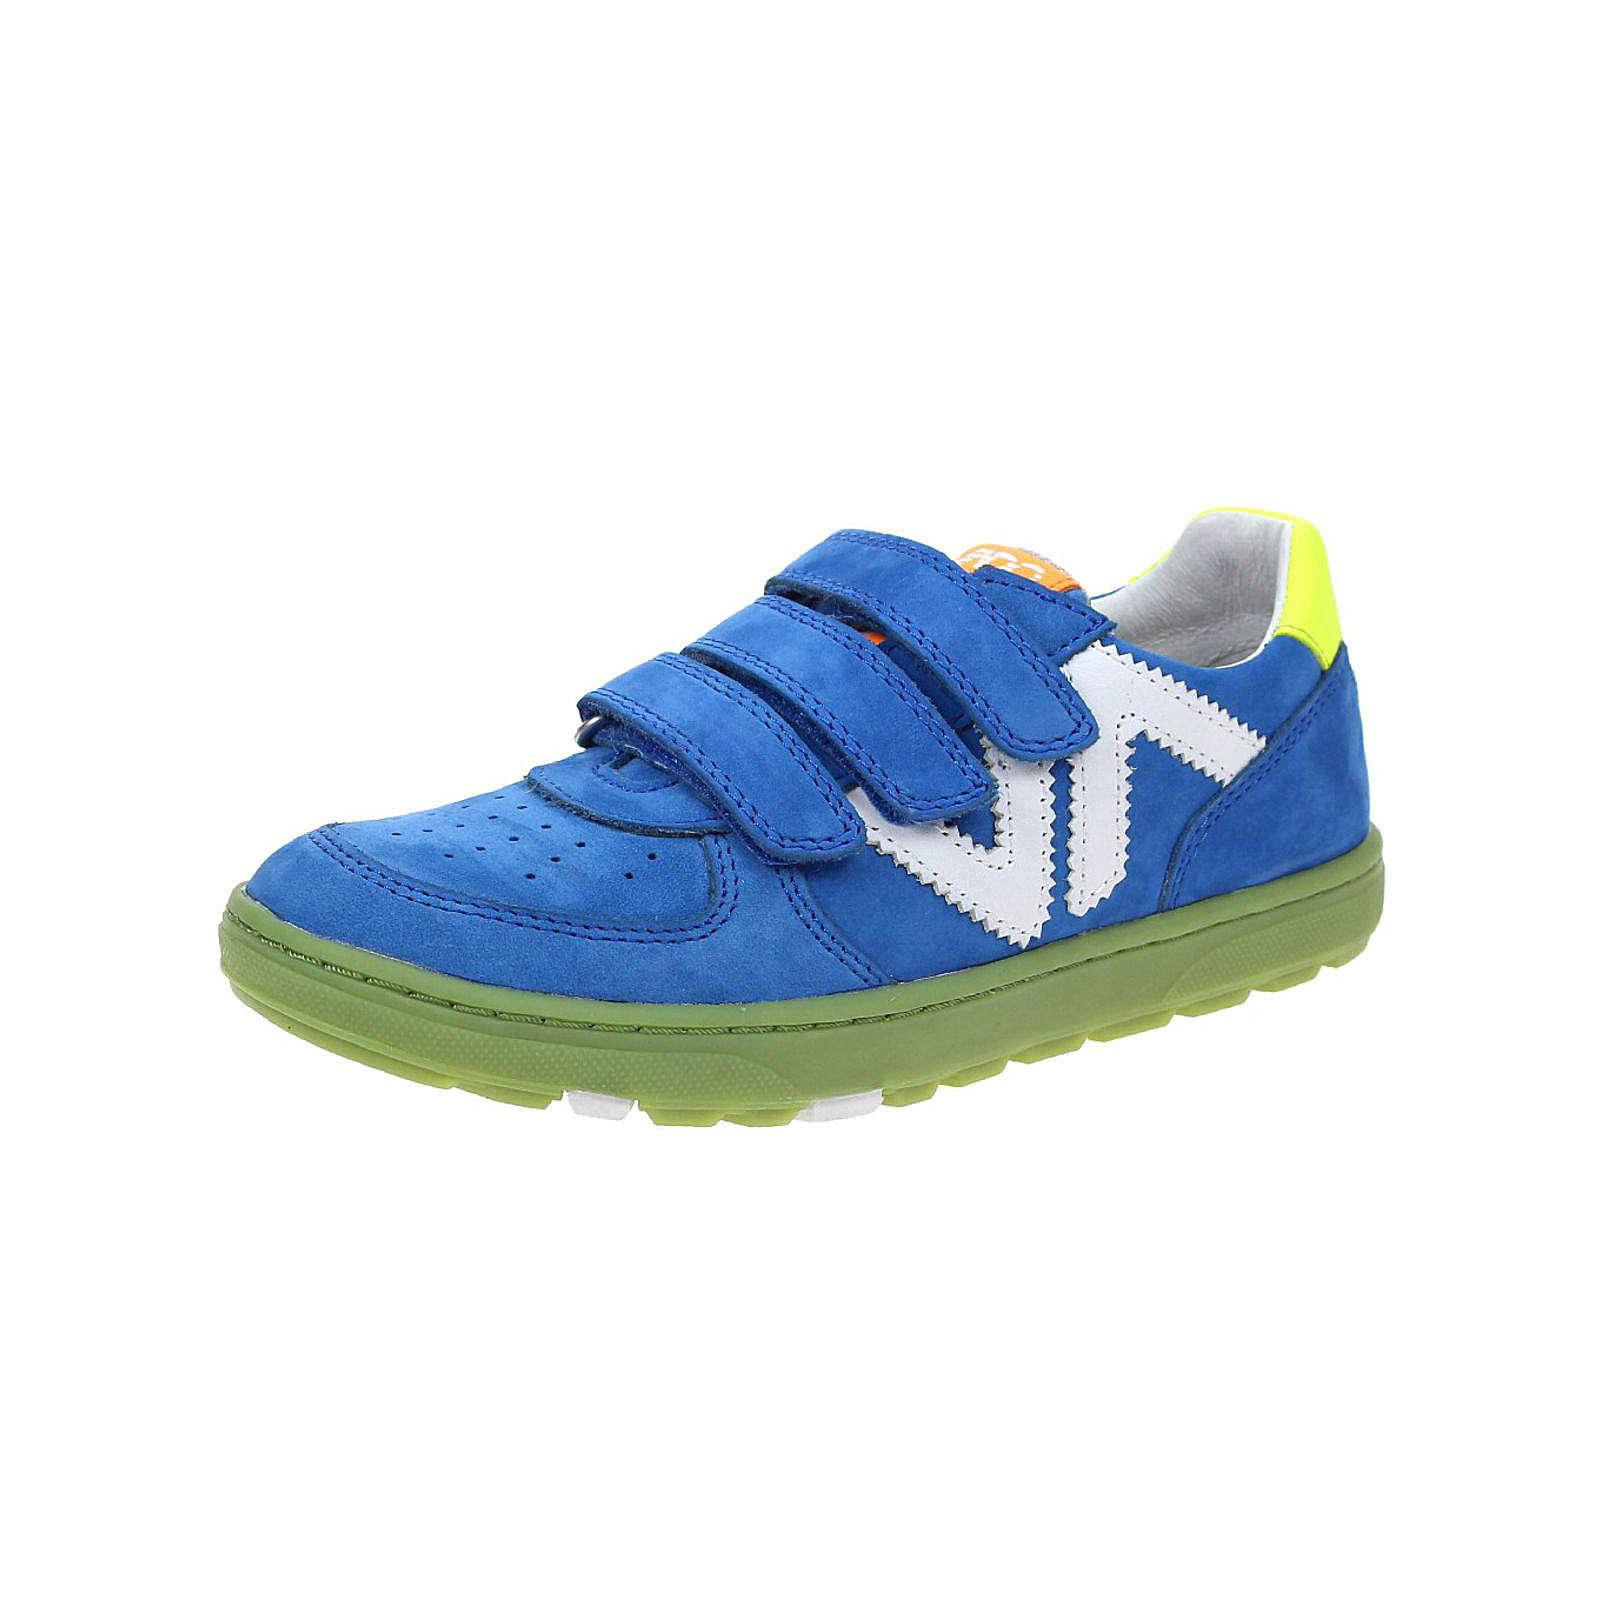 VADO Sportschuhe blau Junge Gr. 32